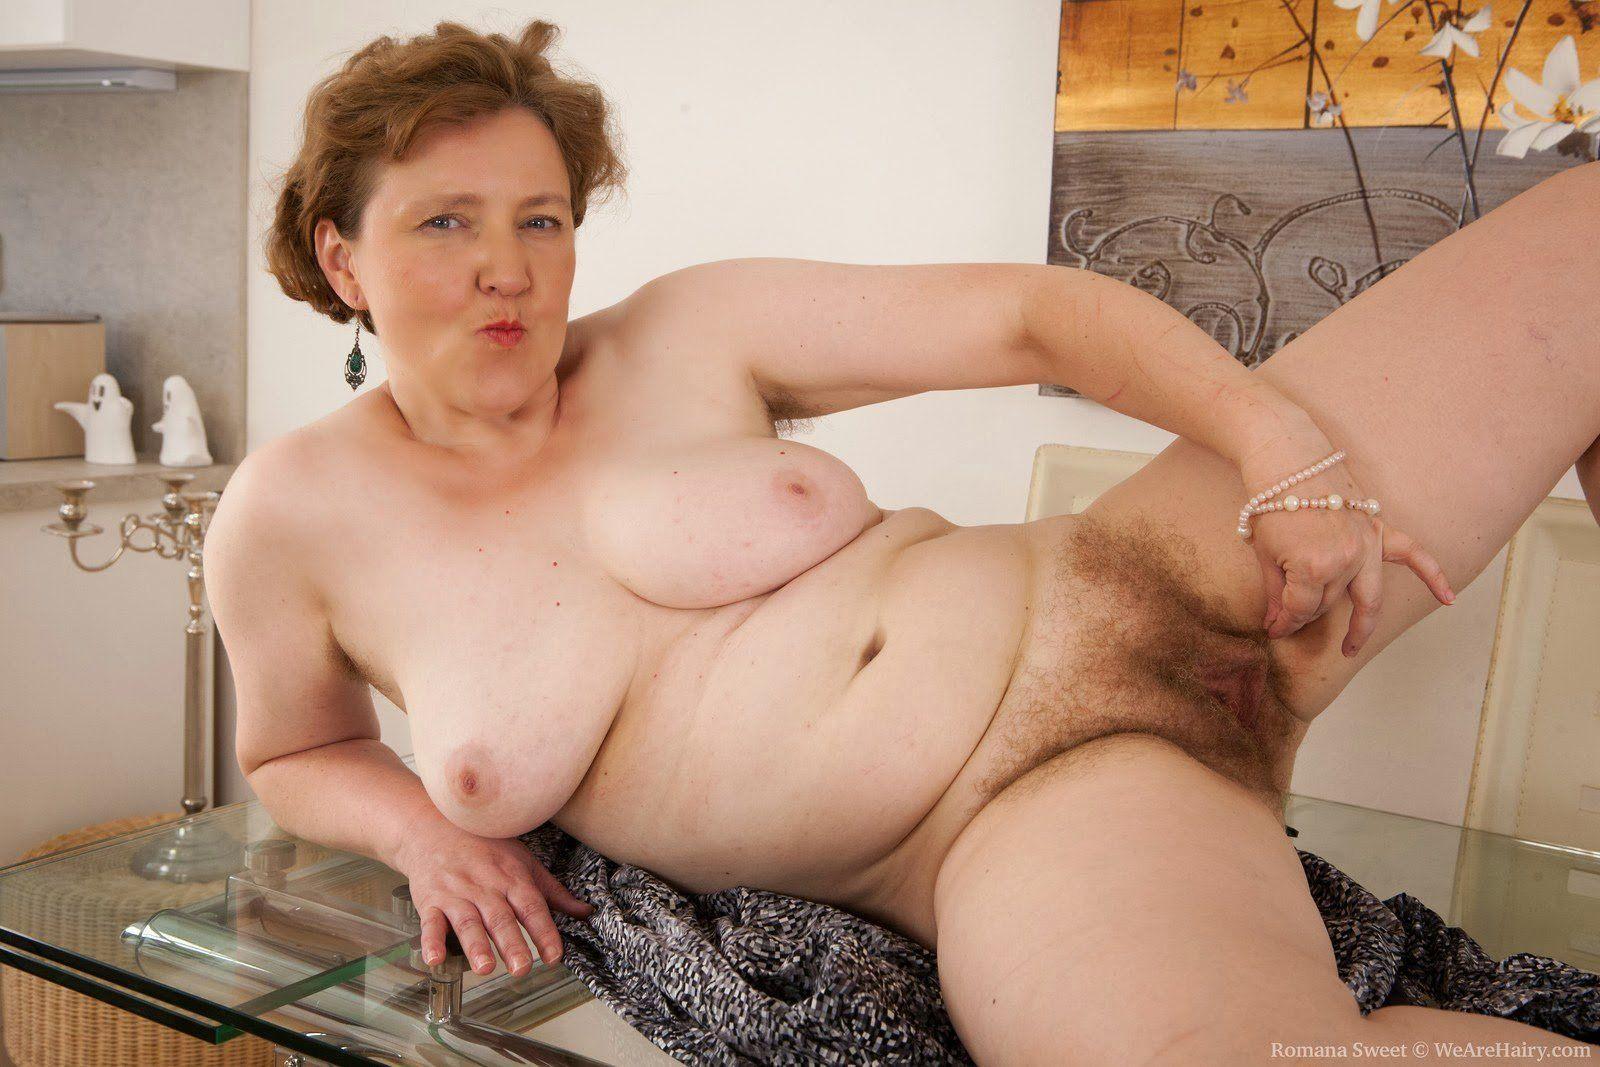 Nude hairy women Nude Hairy